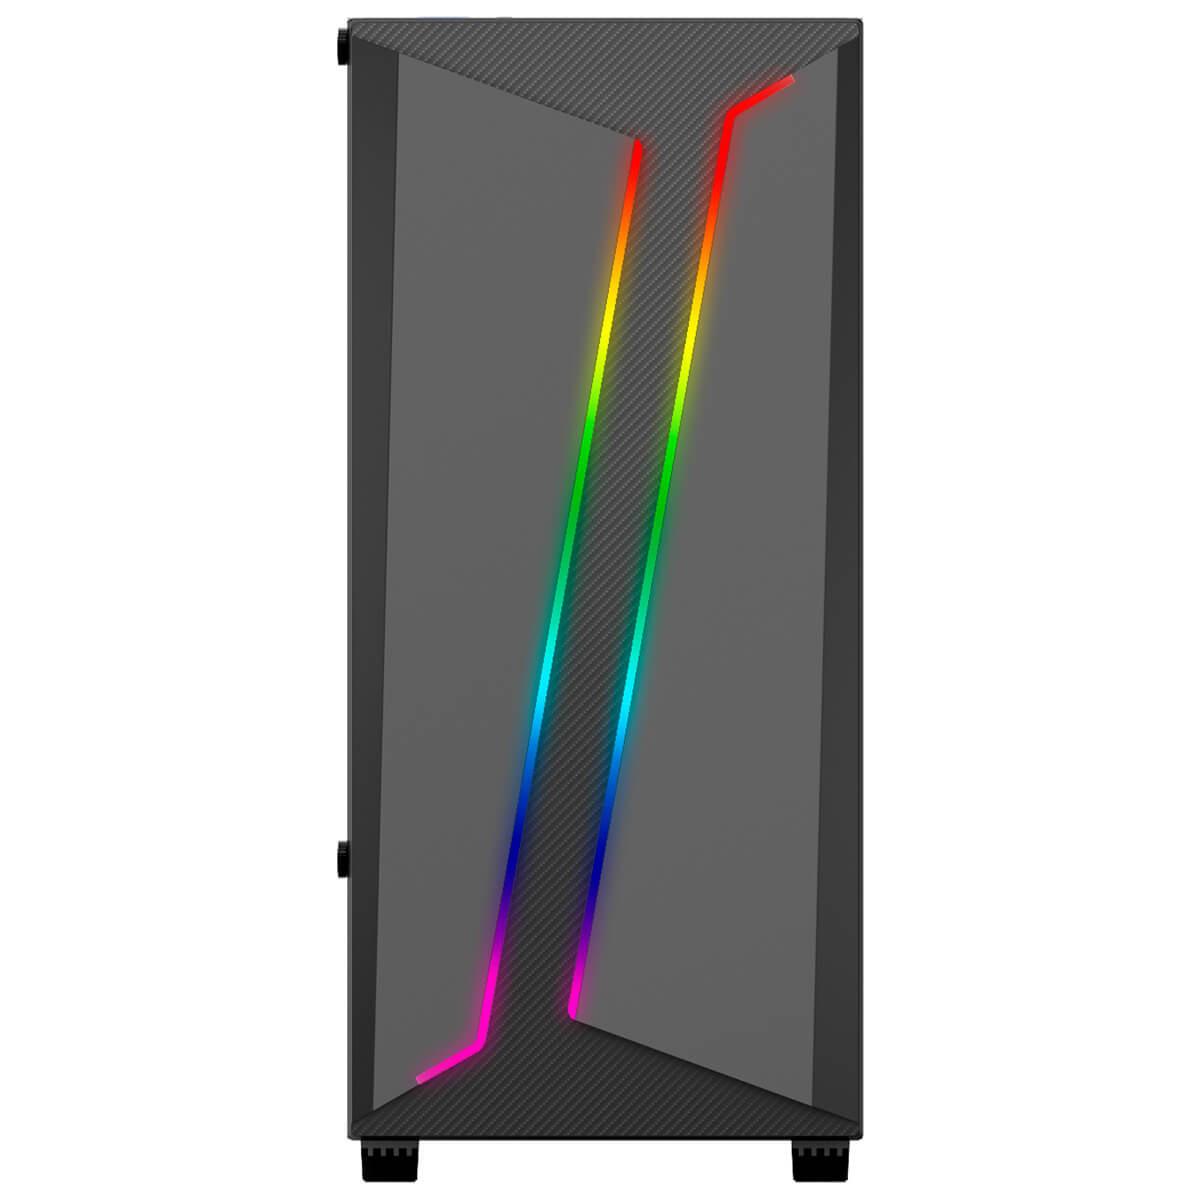 GABINETE GAMER BG-038 PRETO BLUECASE LED RGB USB 3.0